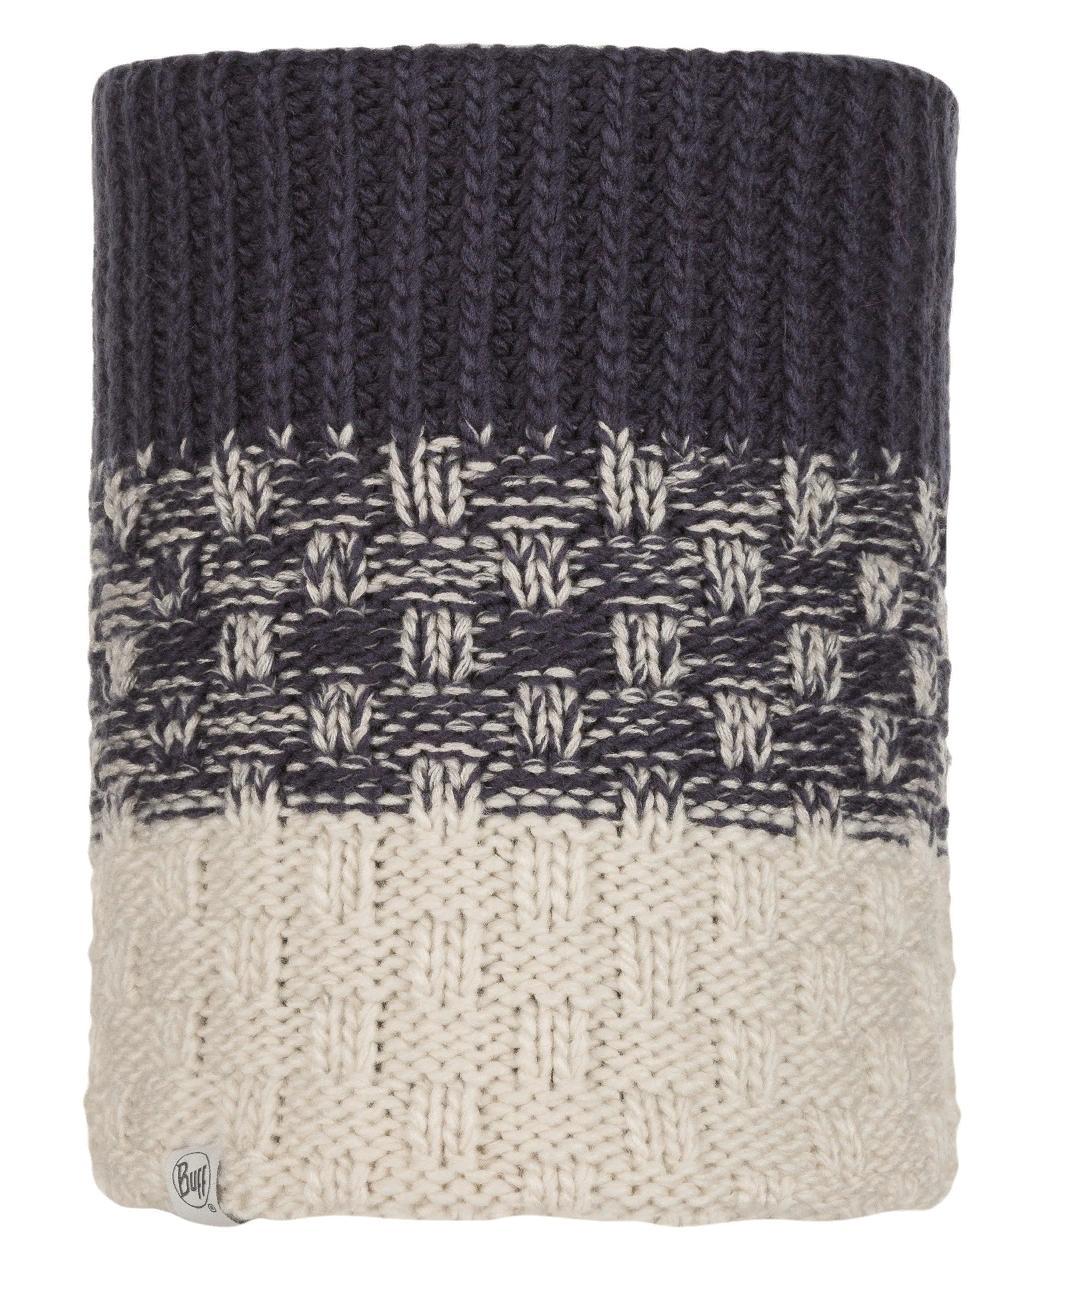 Шарф Buff Knitted & Polar Neckwarmer Tait Dark Denim Jr